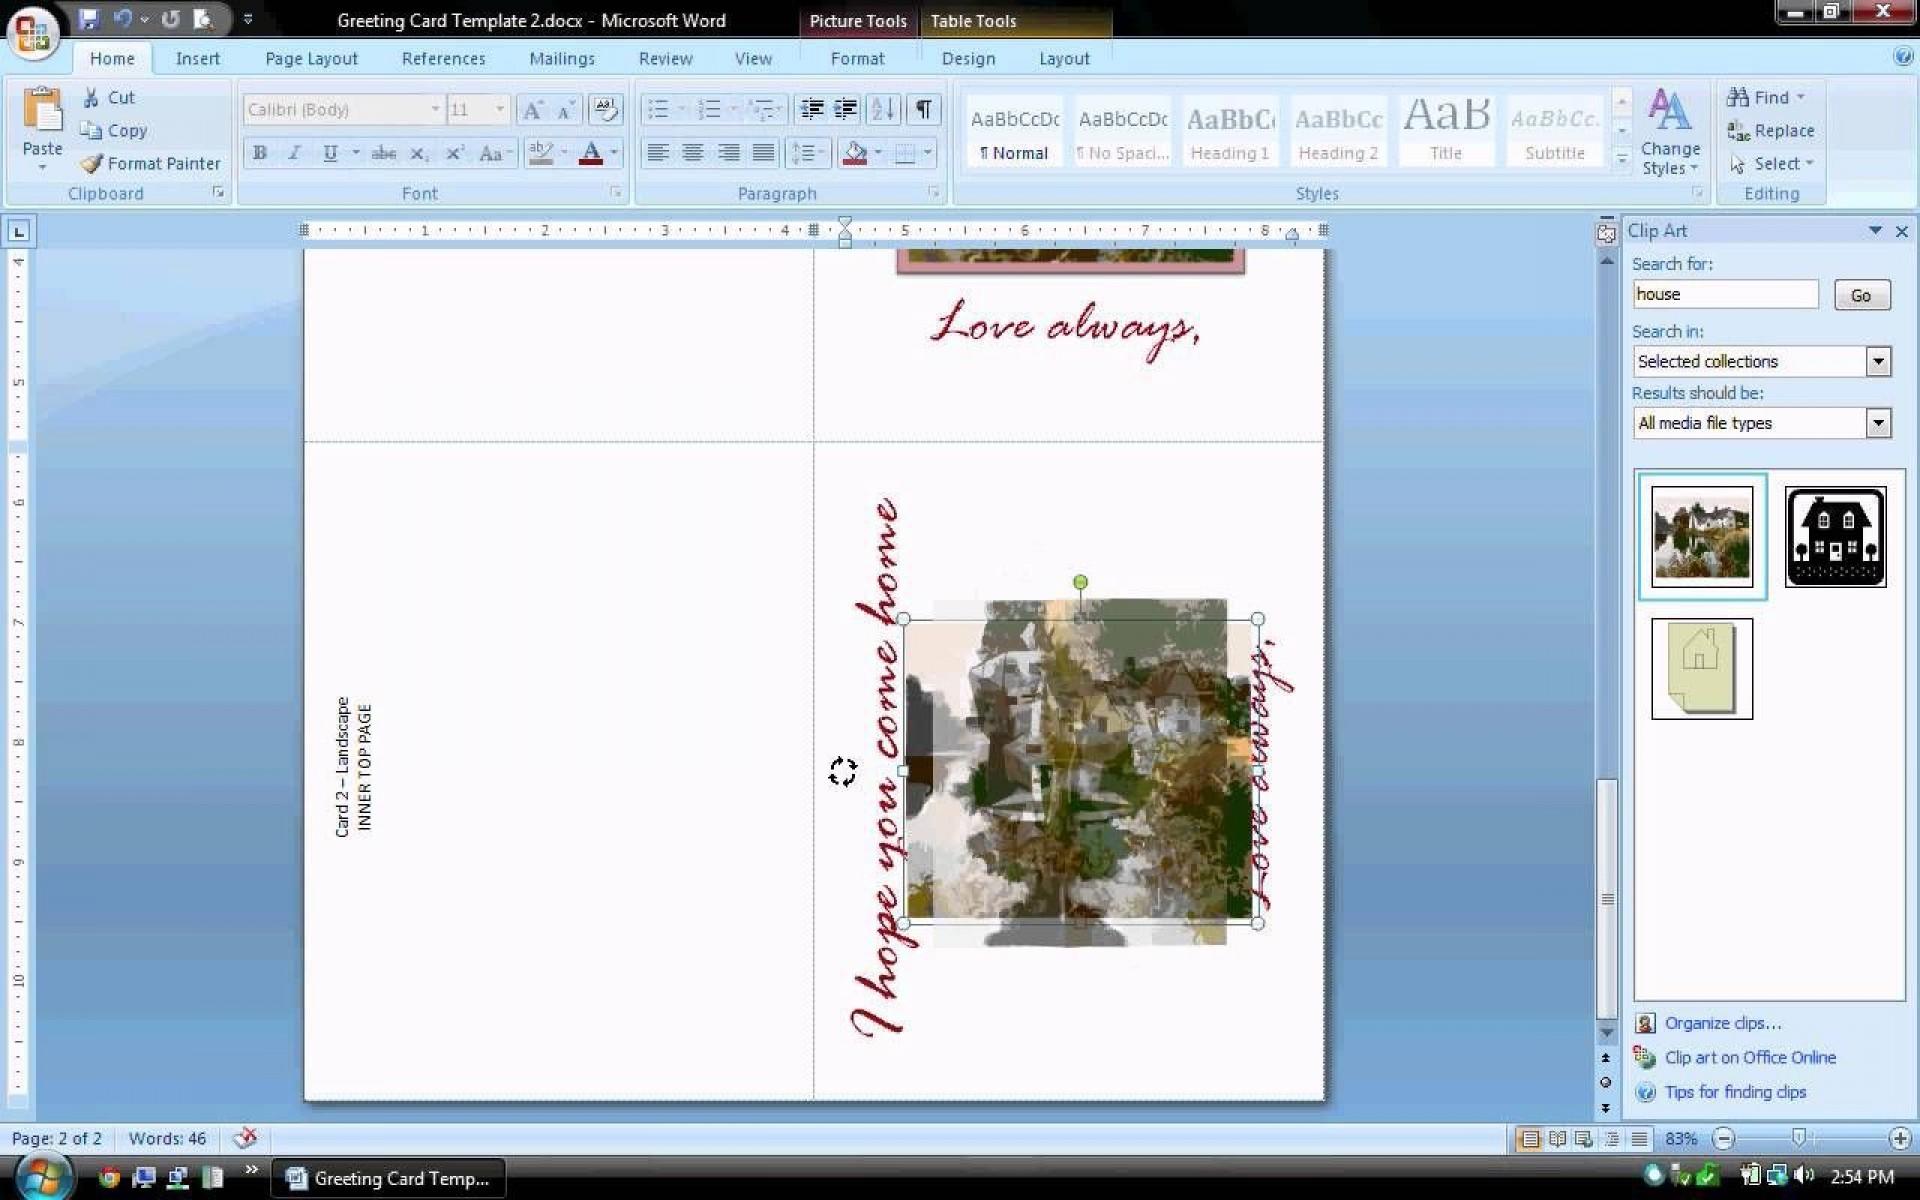 004 Beautiful Microsoft Word Greeting Card Template Idea  2003 Birthday Download1920